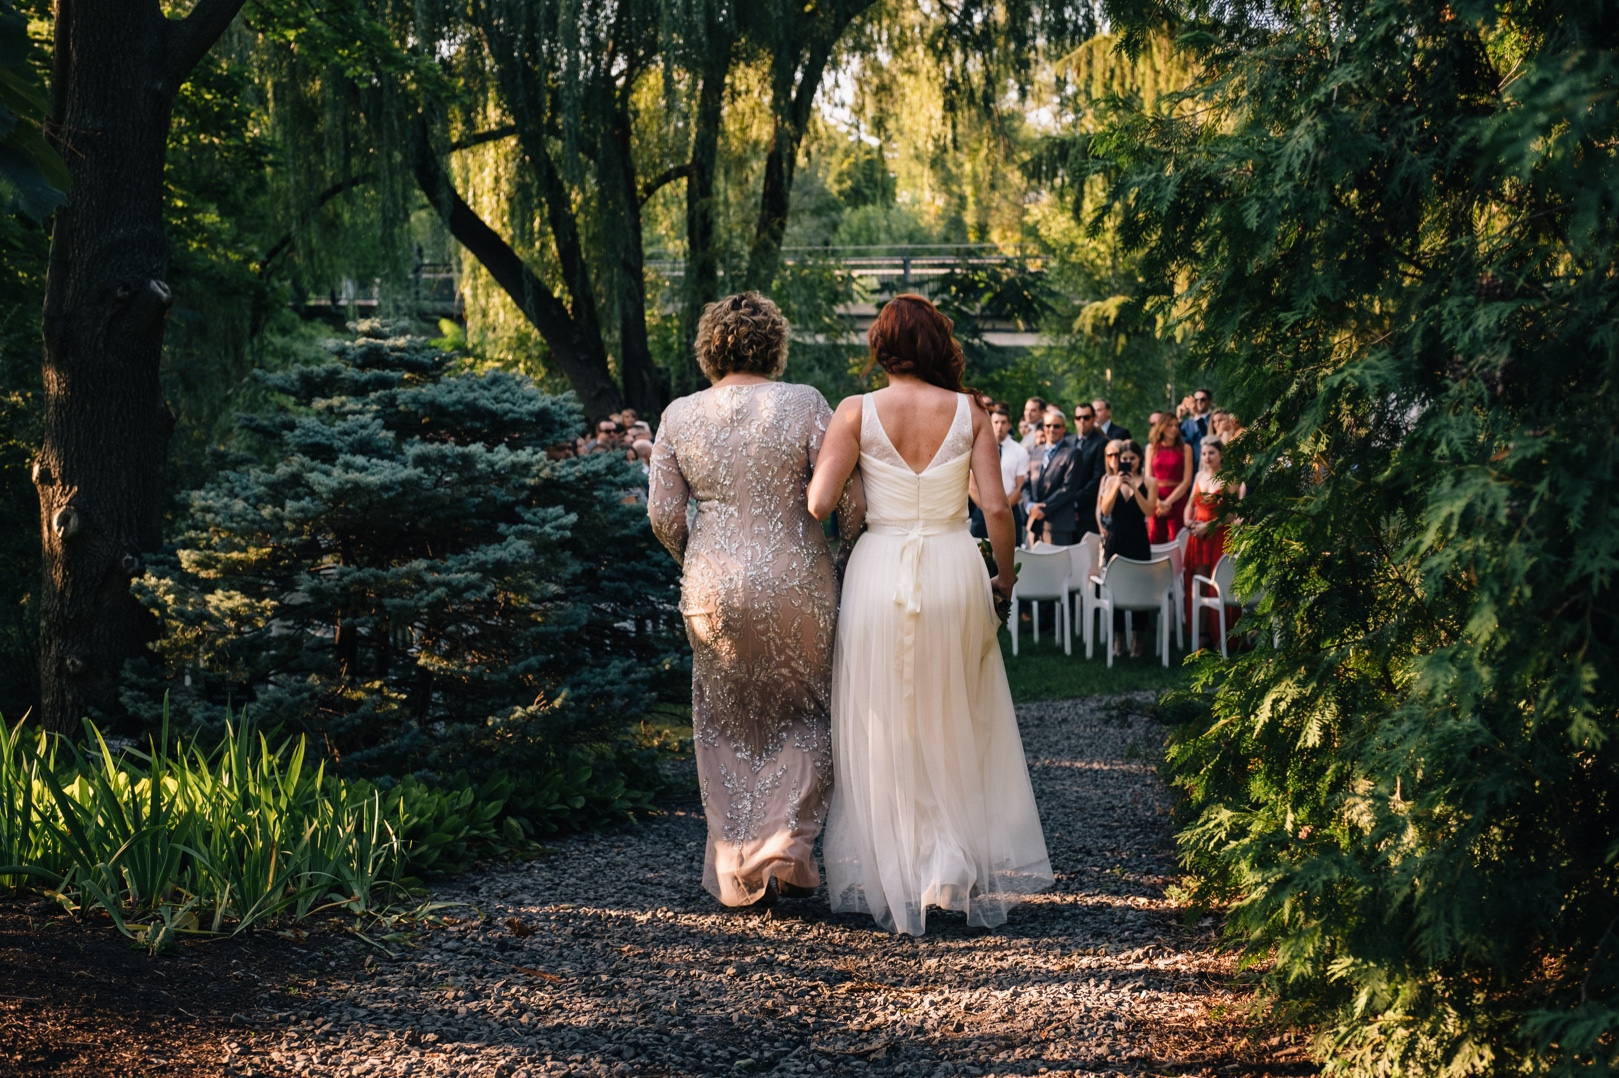 67_JACQUELINE RICHARD WEDDING-498_Events_Weddings_2018_Travel_Engagement_Photography_best_Portraits.jpg